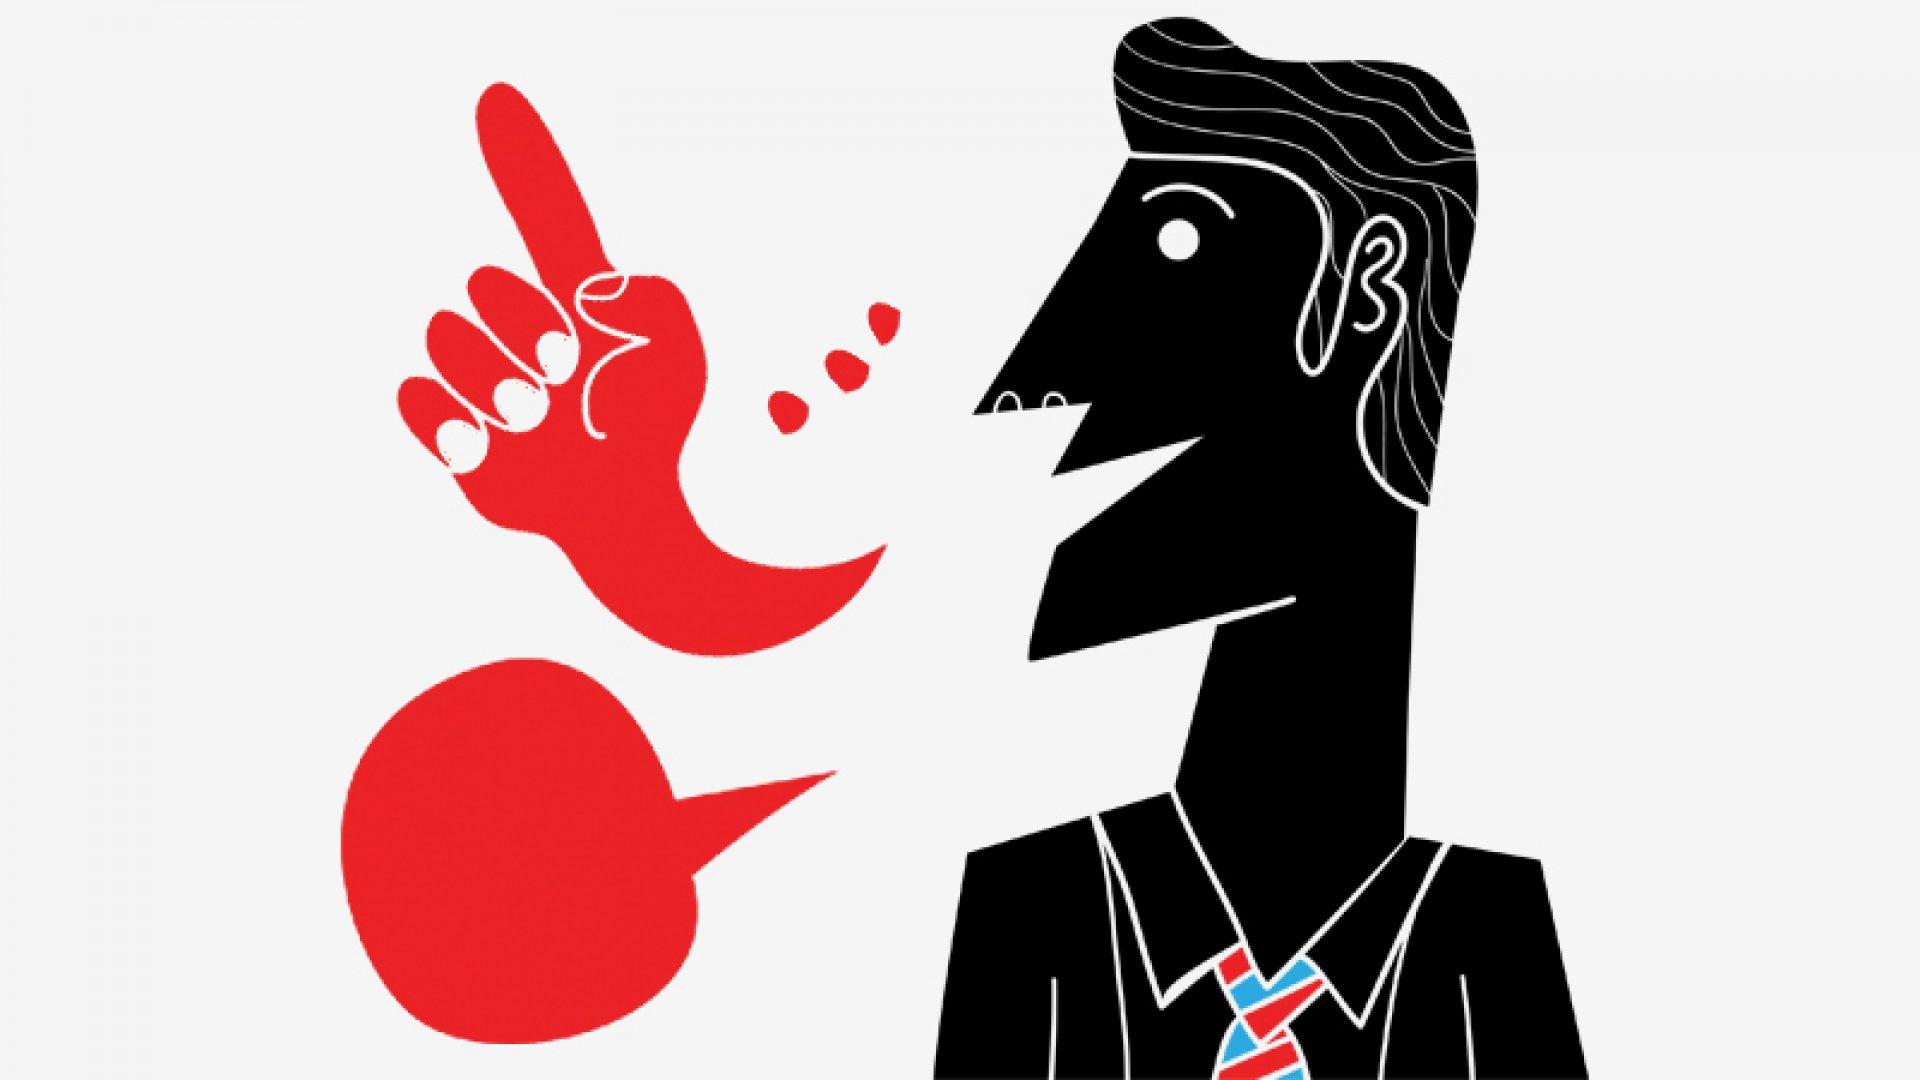 'Mansplaining': The Real Reason Men Like to Explain